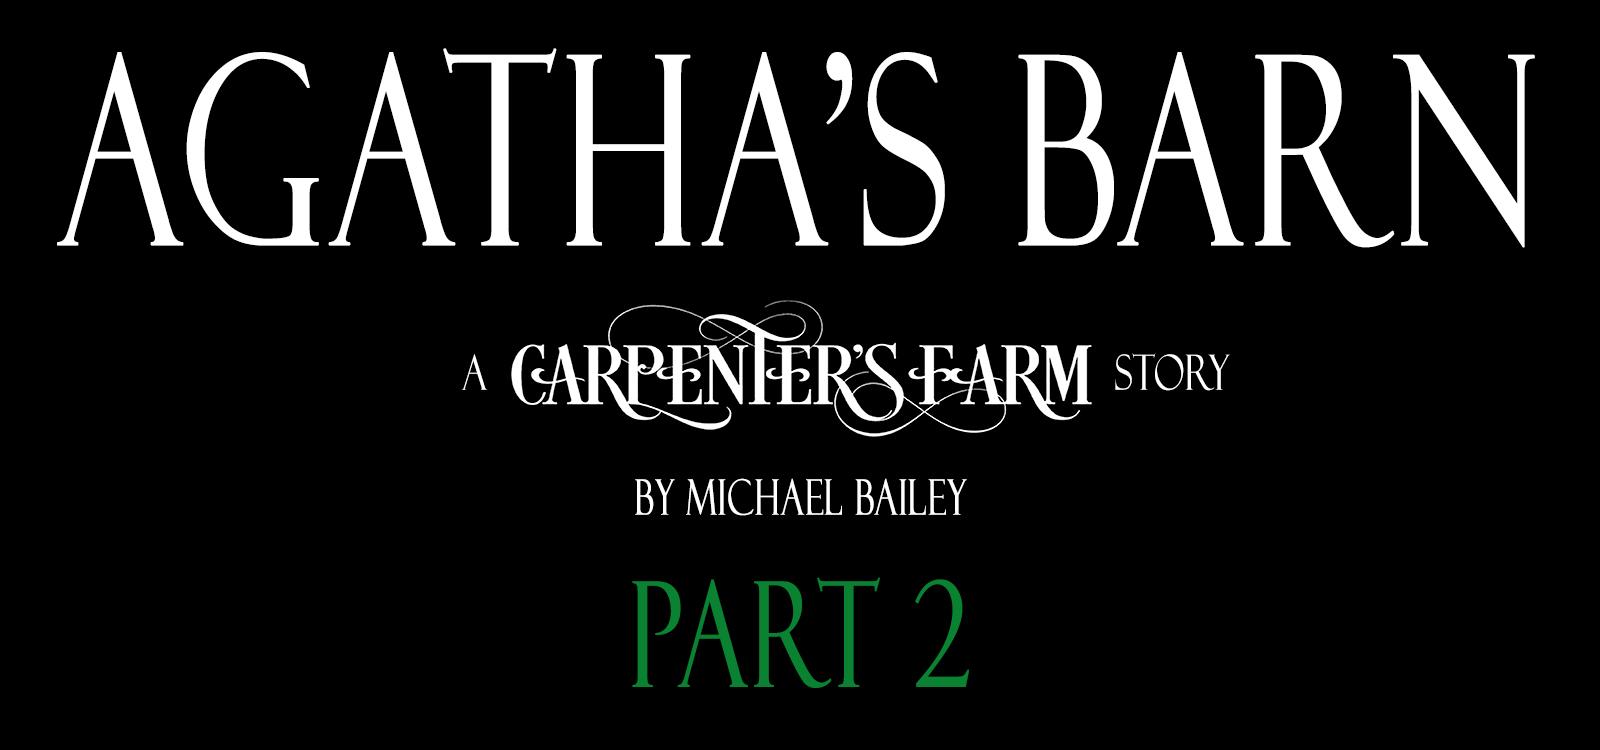 agathas_barn_logo_pt2